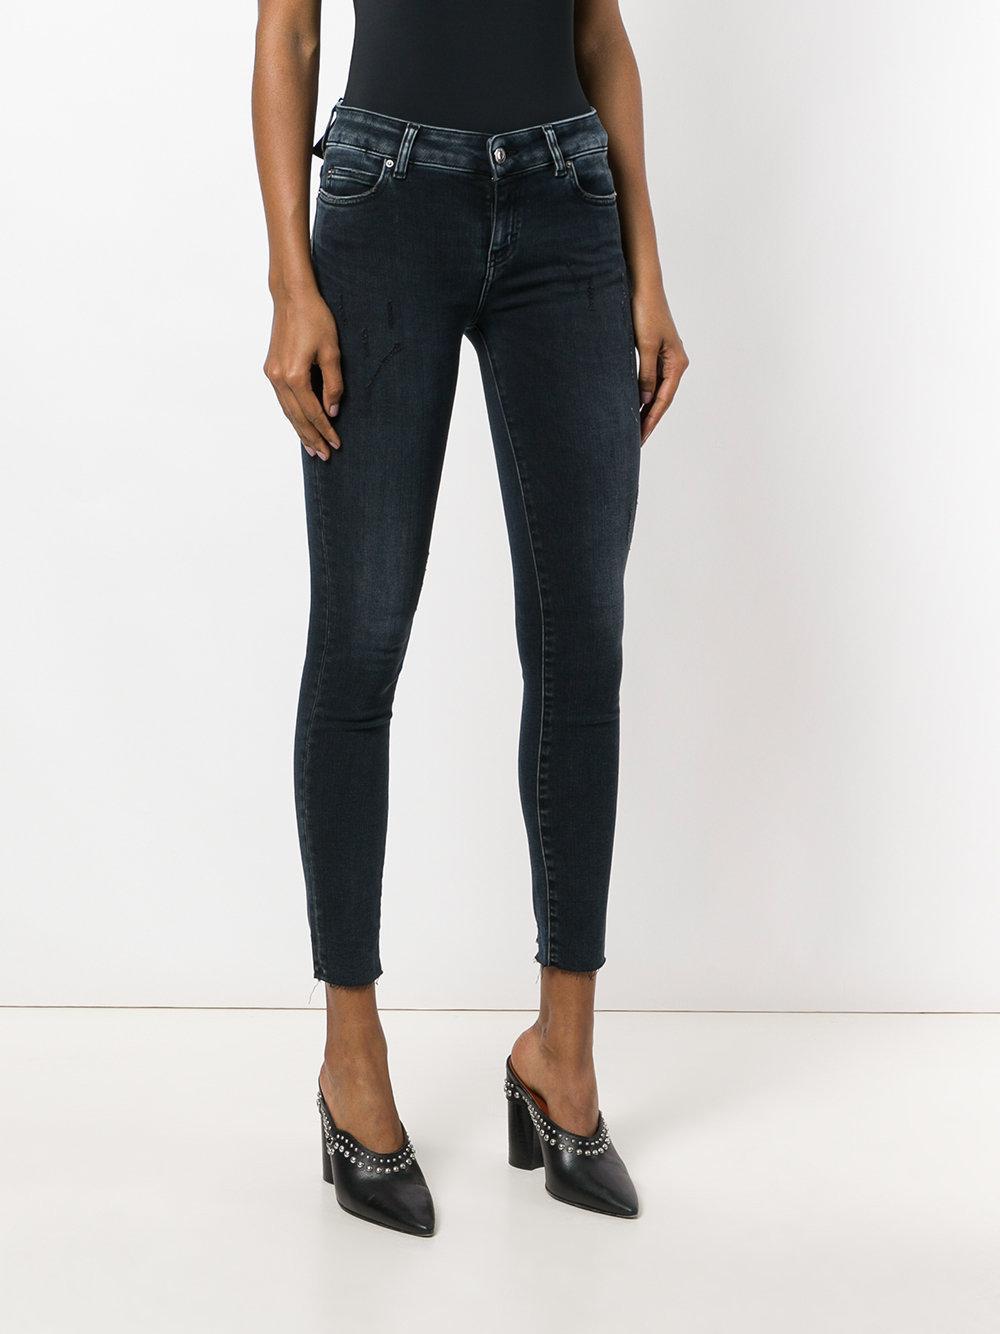 IRO Denim Slim Fit Jeans in Black